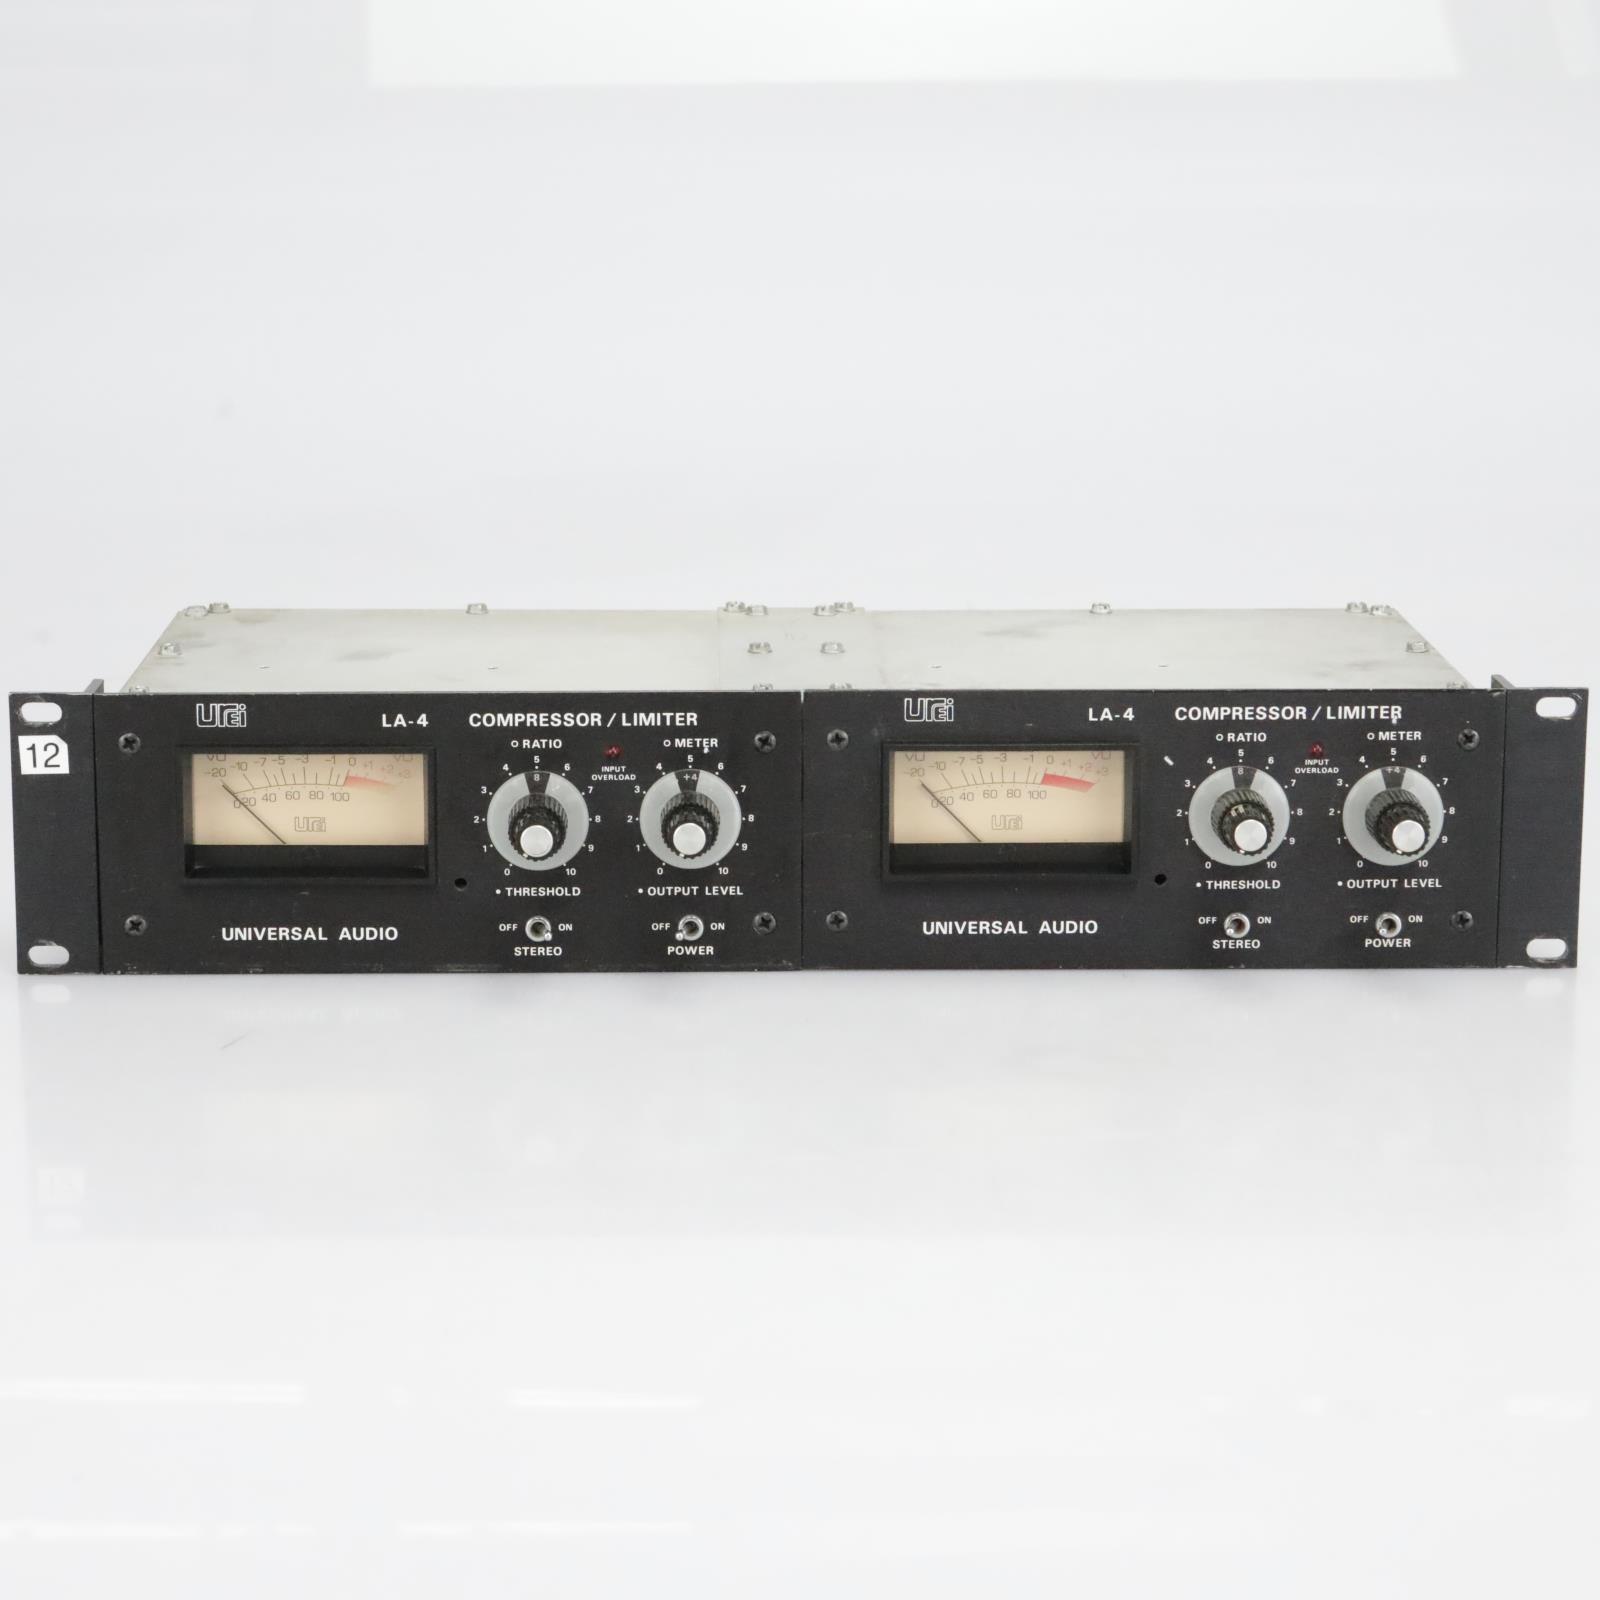 2 Urei Universal Audio LA-4 Compressor / Limiter Rack Mounted #40283